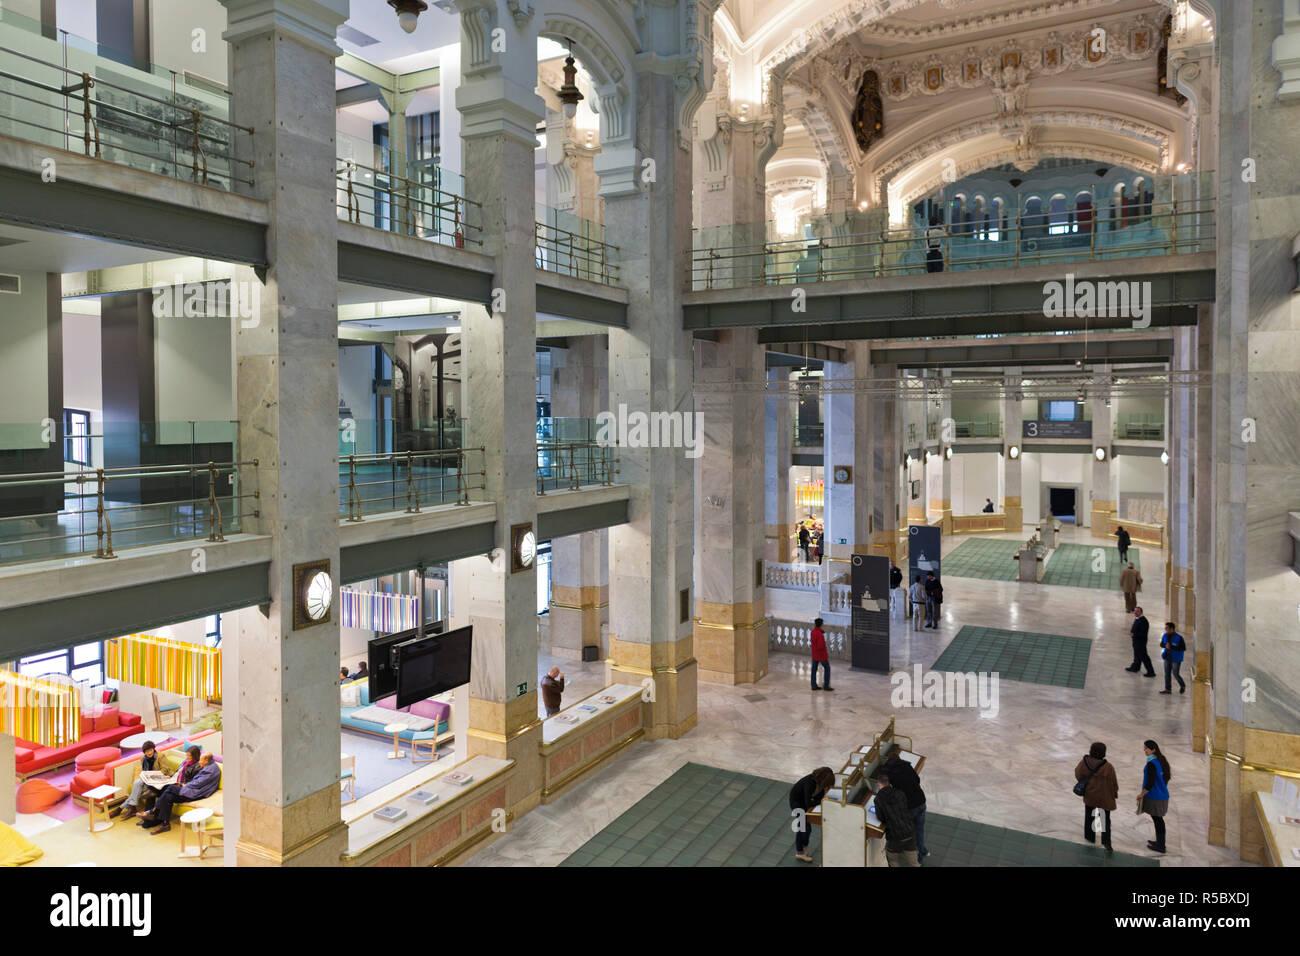 Spain, Madrid, Plaza de la Cibeles, Palacio de Communicaciones, once the world's biggest post office renovated into the El Centro exhibition space Stock Photo